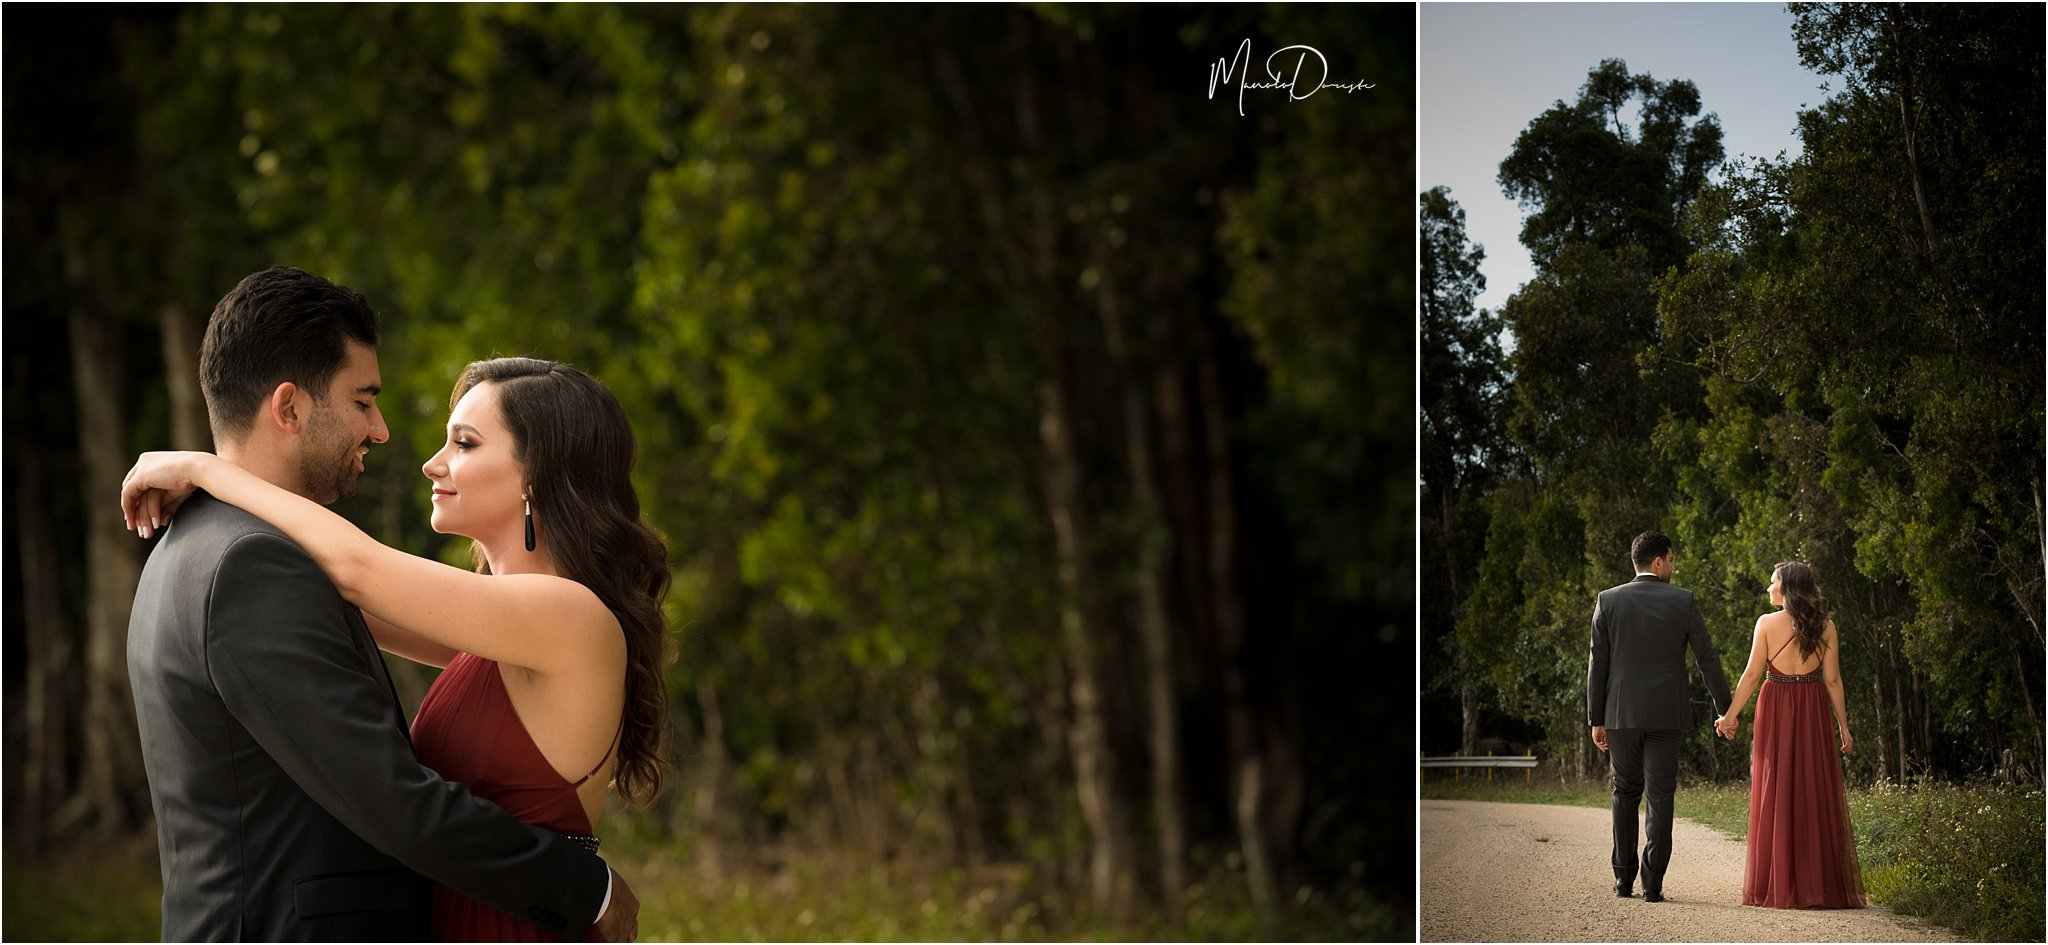 00813_ManoloDoreste_InFocusStudios_Wedding_Family_Photography_Miami_MiamiPhotographer.jpg